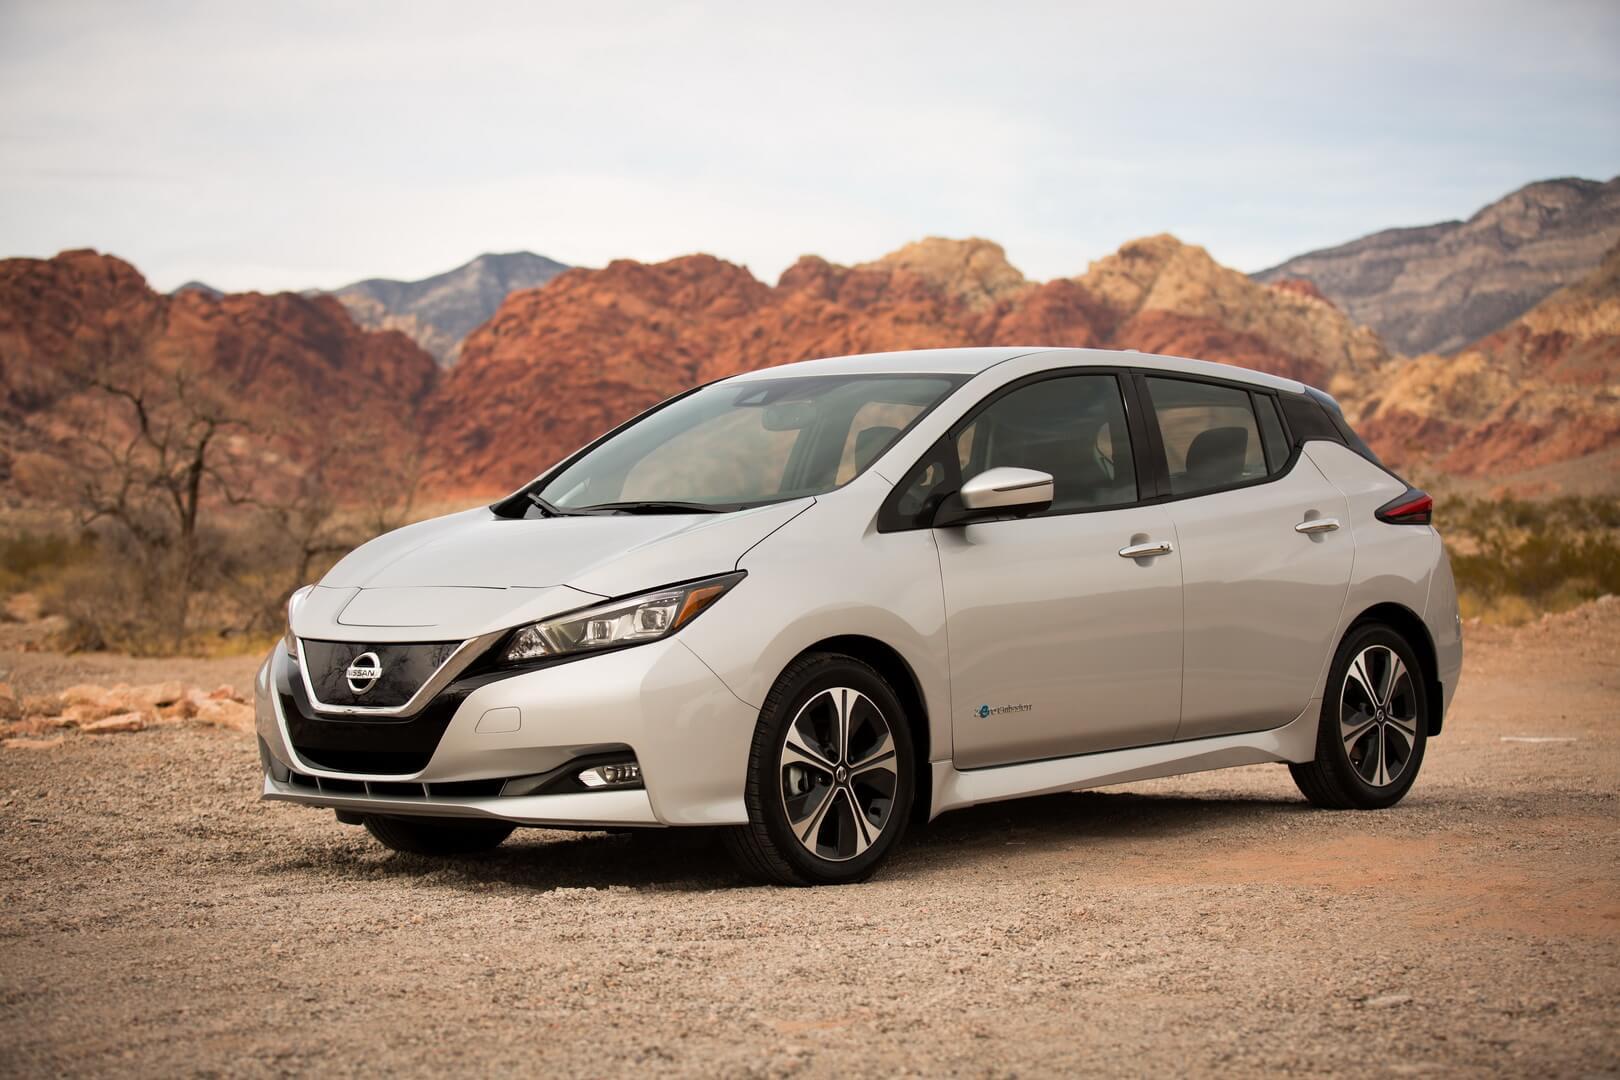 Электромобиль Nissan Leaf e+ 2019 с батареей 62 кВт⋅ч